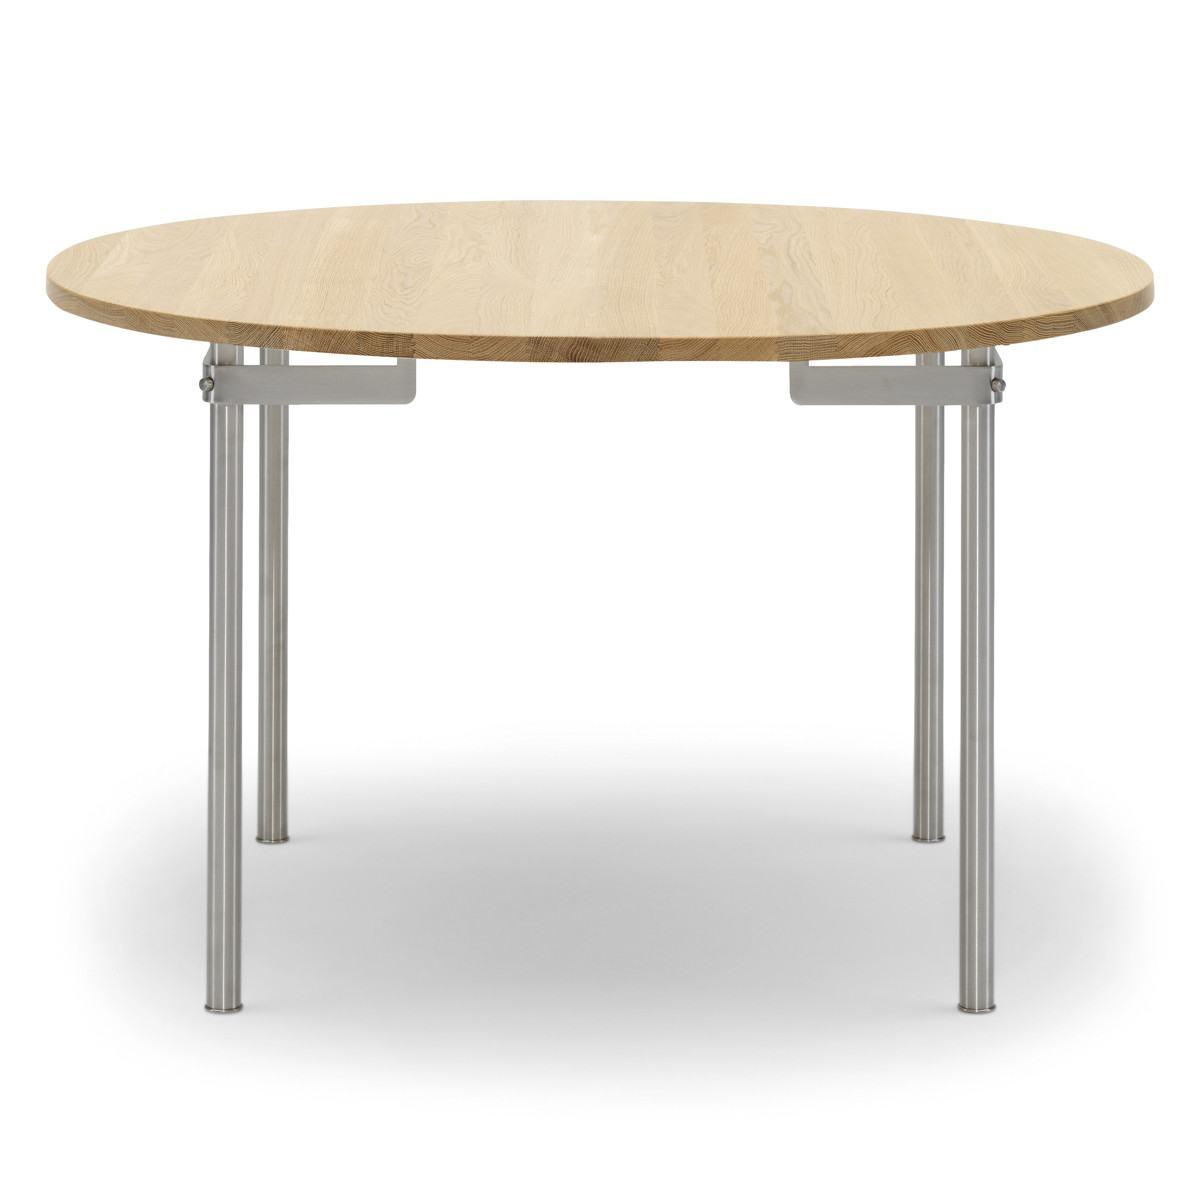 Carl hansen CH388 Dining Table